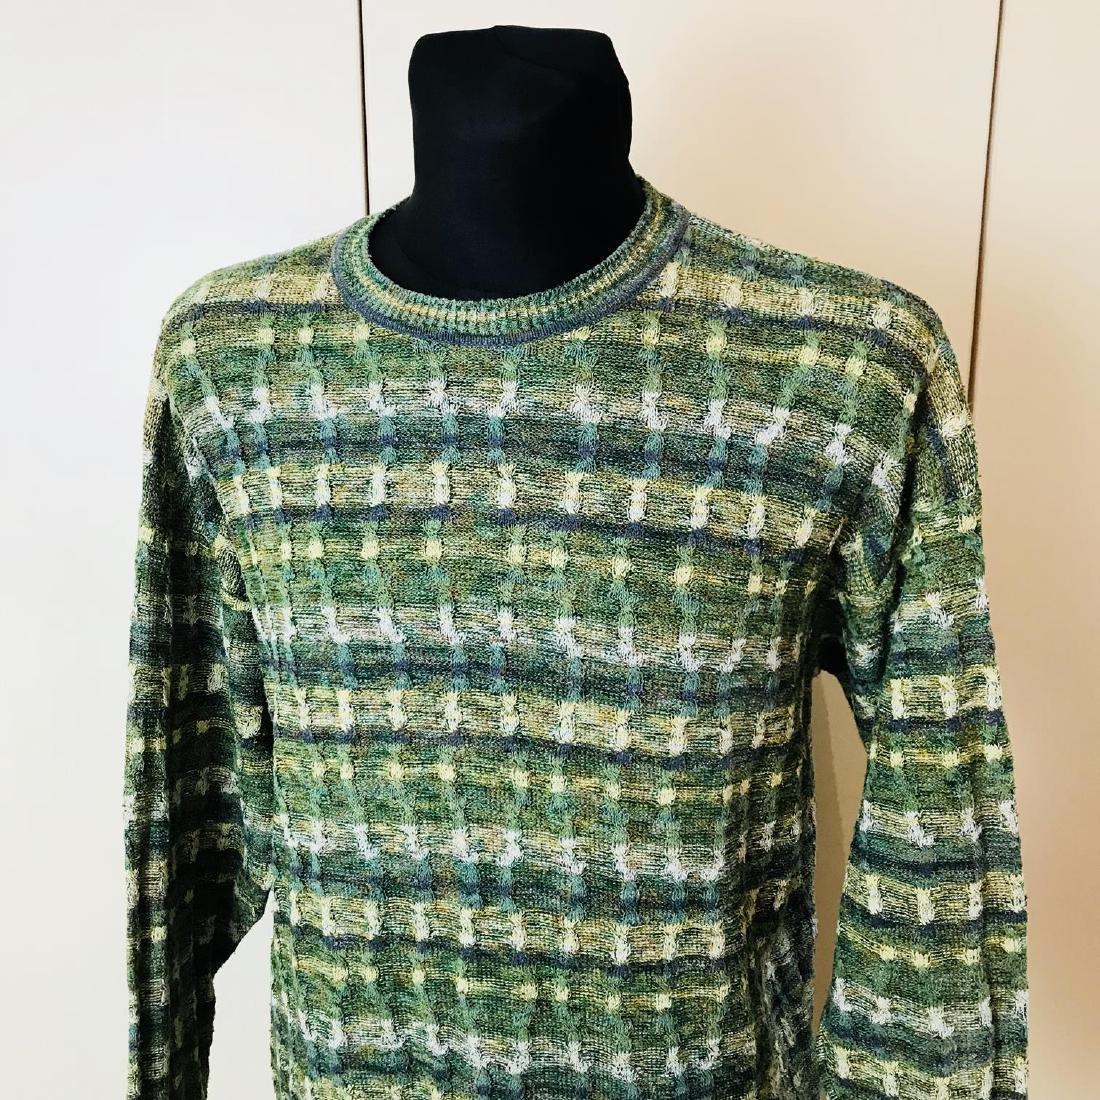 Vintage Men's Italian Designer Sweater Size 44 US 54 EU - 2